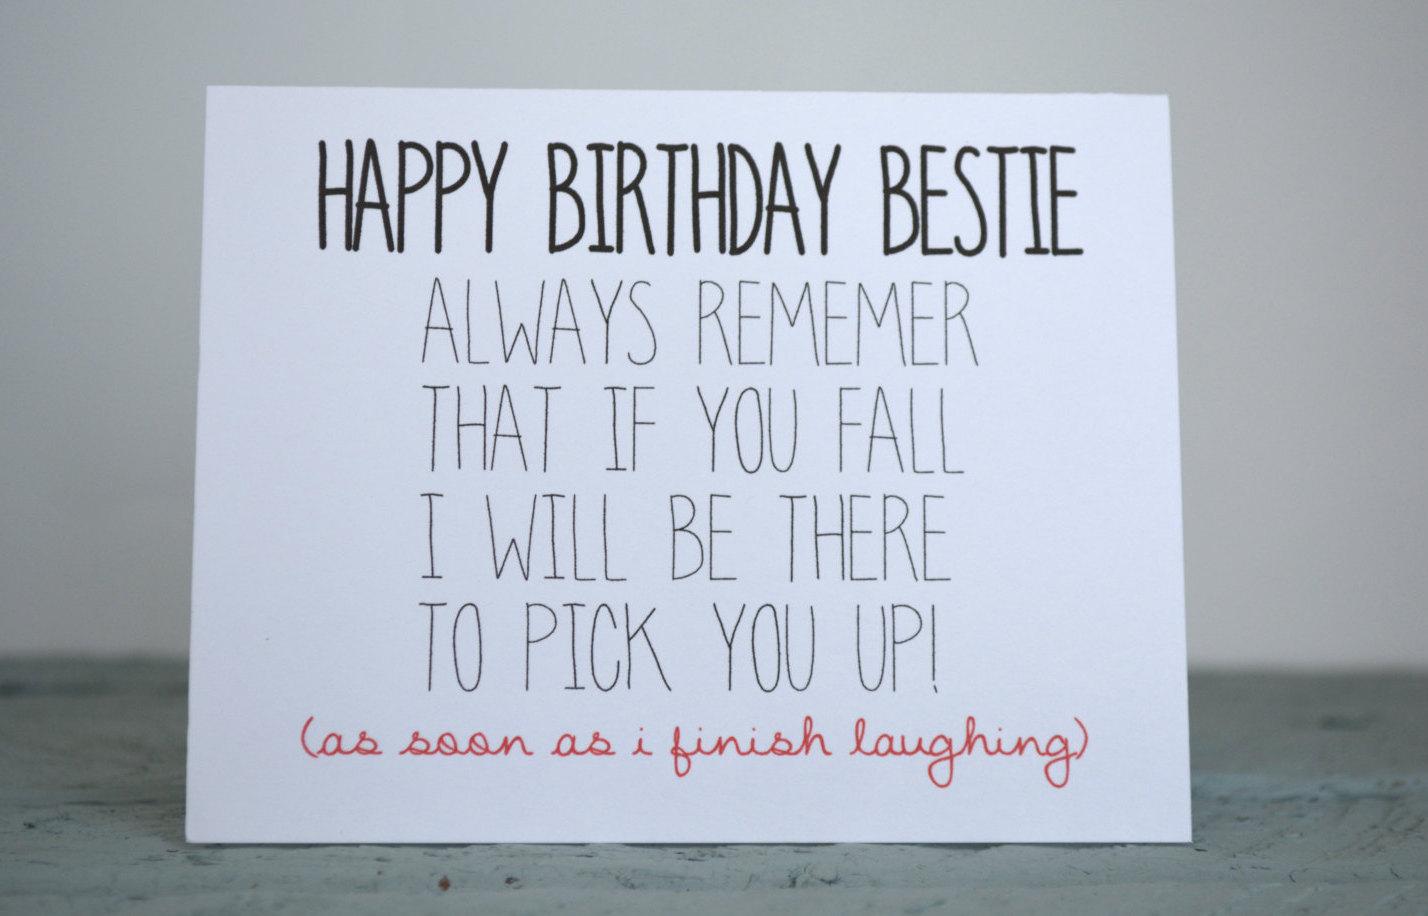 Happy Birthday Godmother Quotes Quotesgram: Happy Birthday Bestie Quotes. QuotesGram